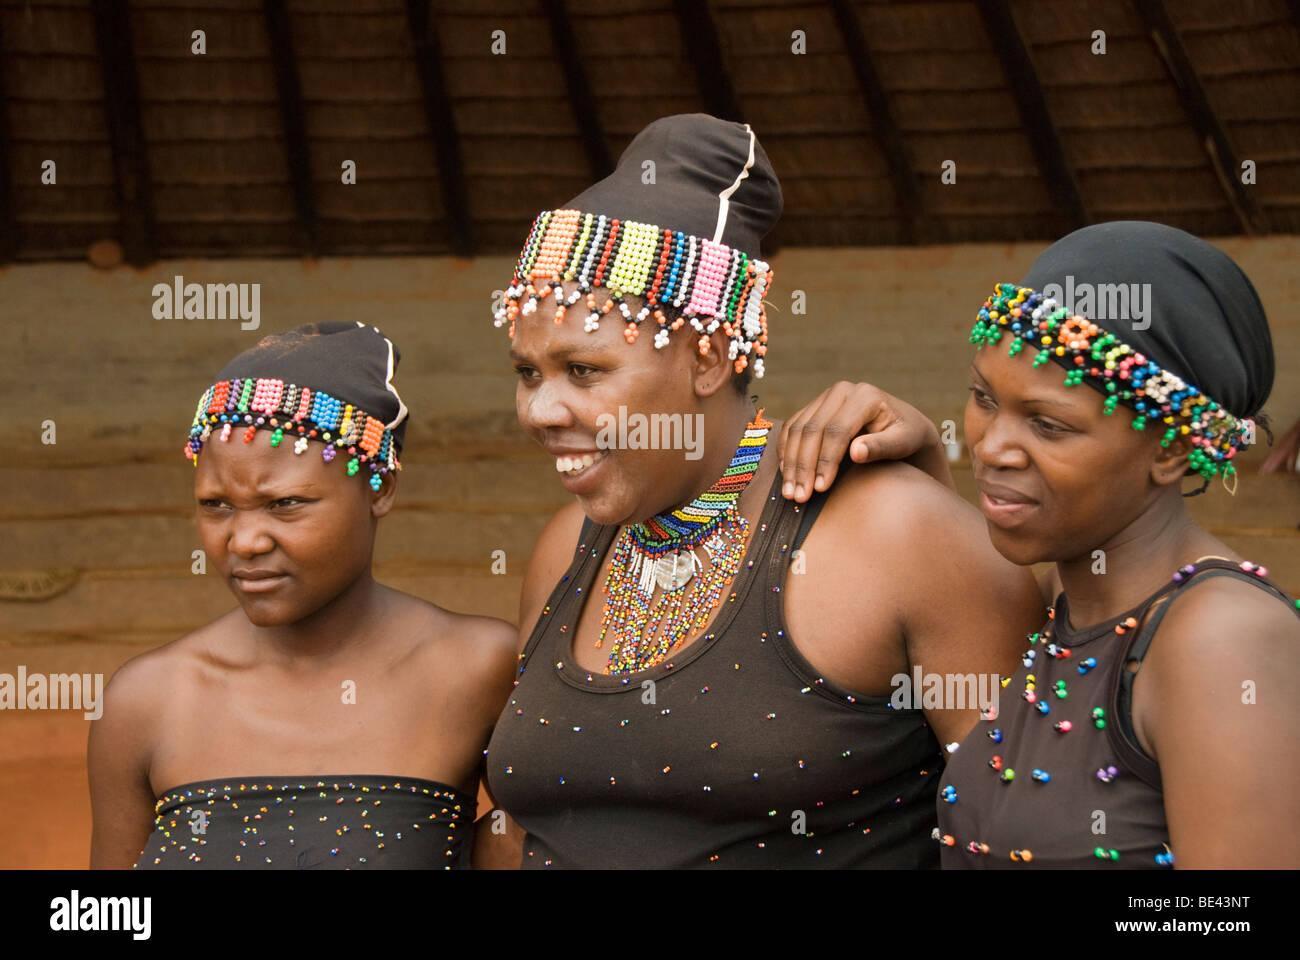 Zulu traditional dress in zulu kraal kwazulu natal - Zulu Maidens In Traditional Dress At Phezulu Safari Park In The Valley Of A Thousand Hills